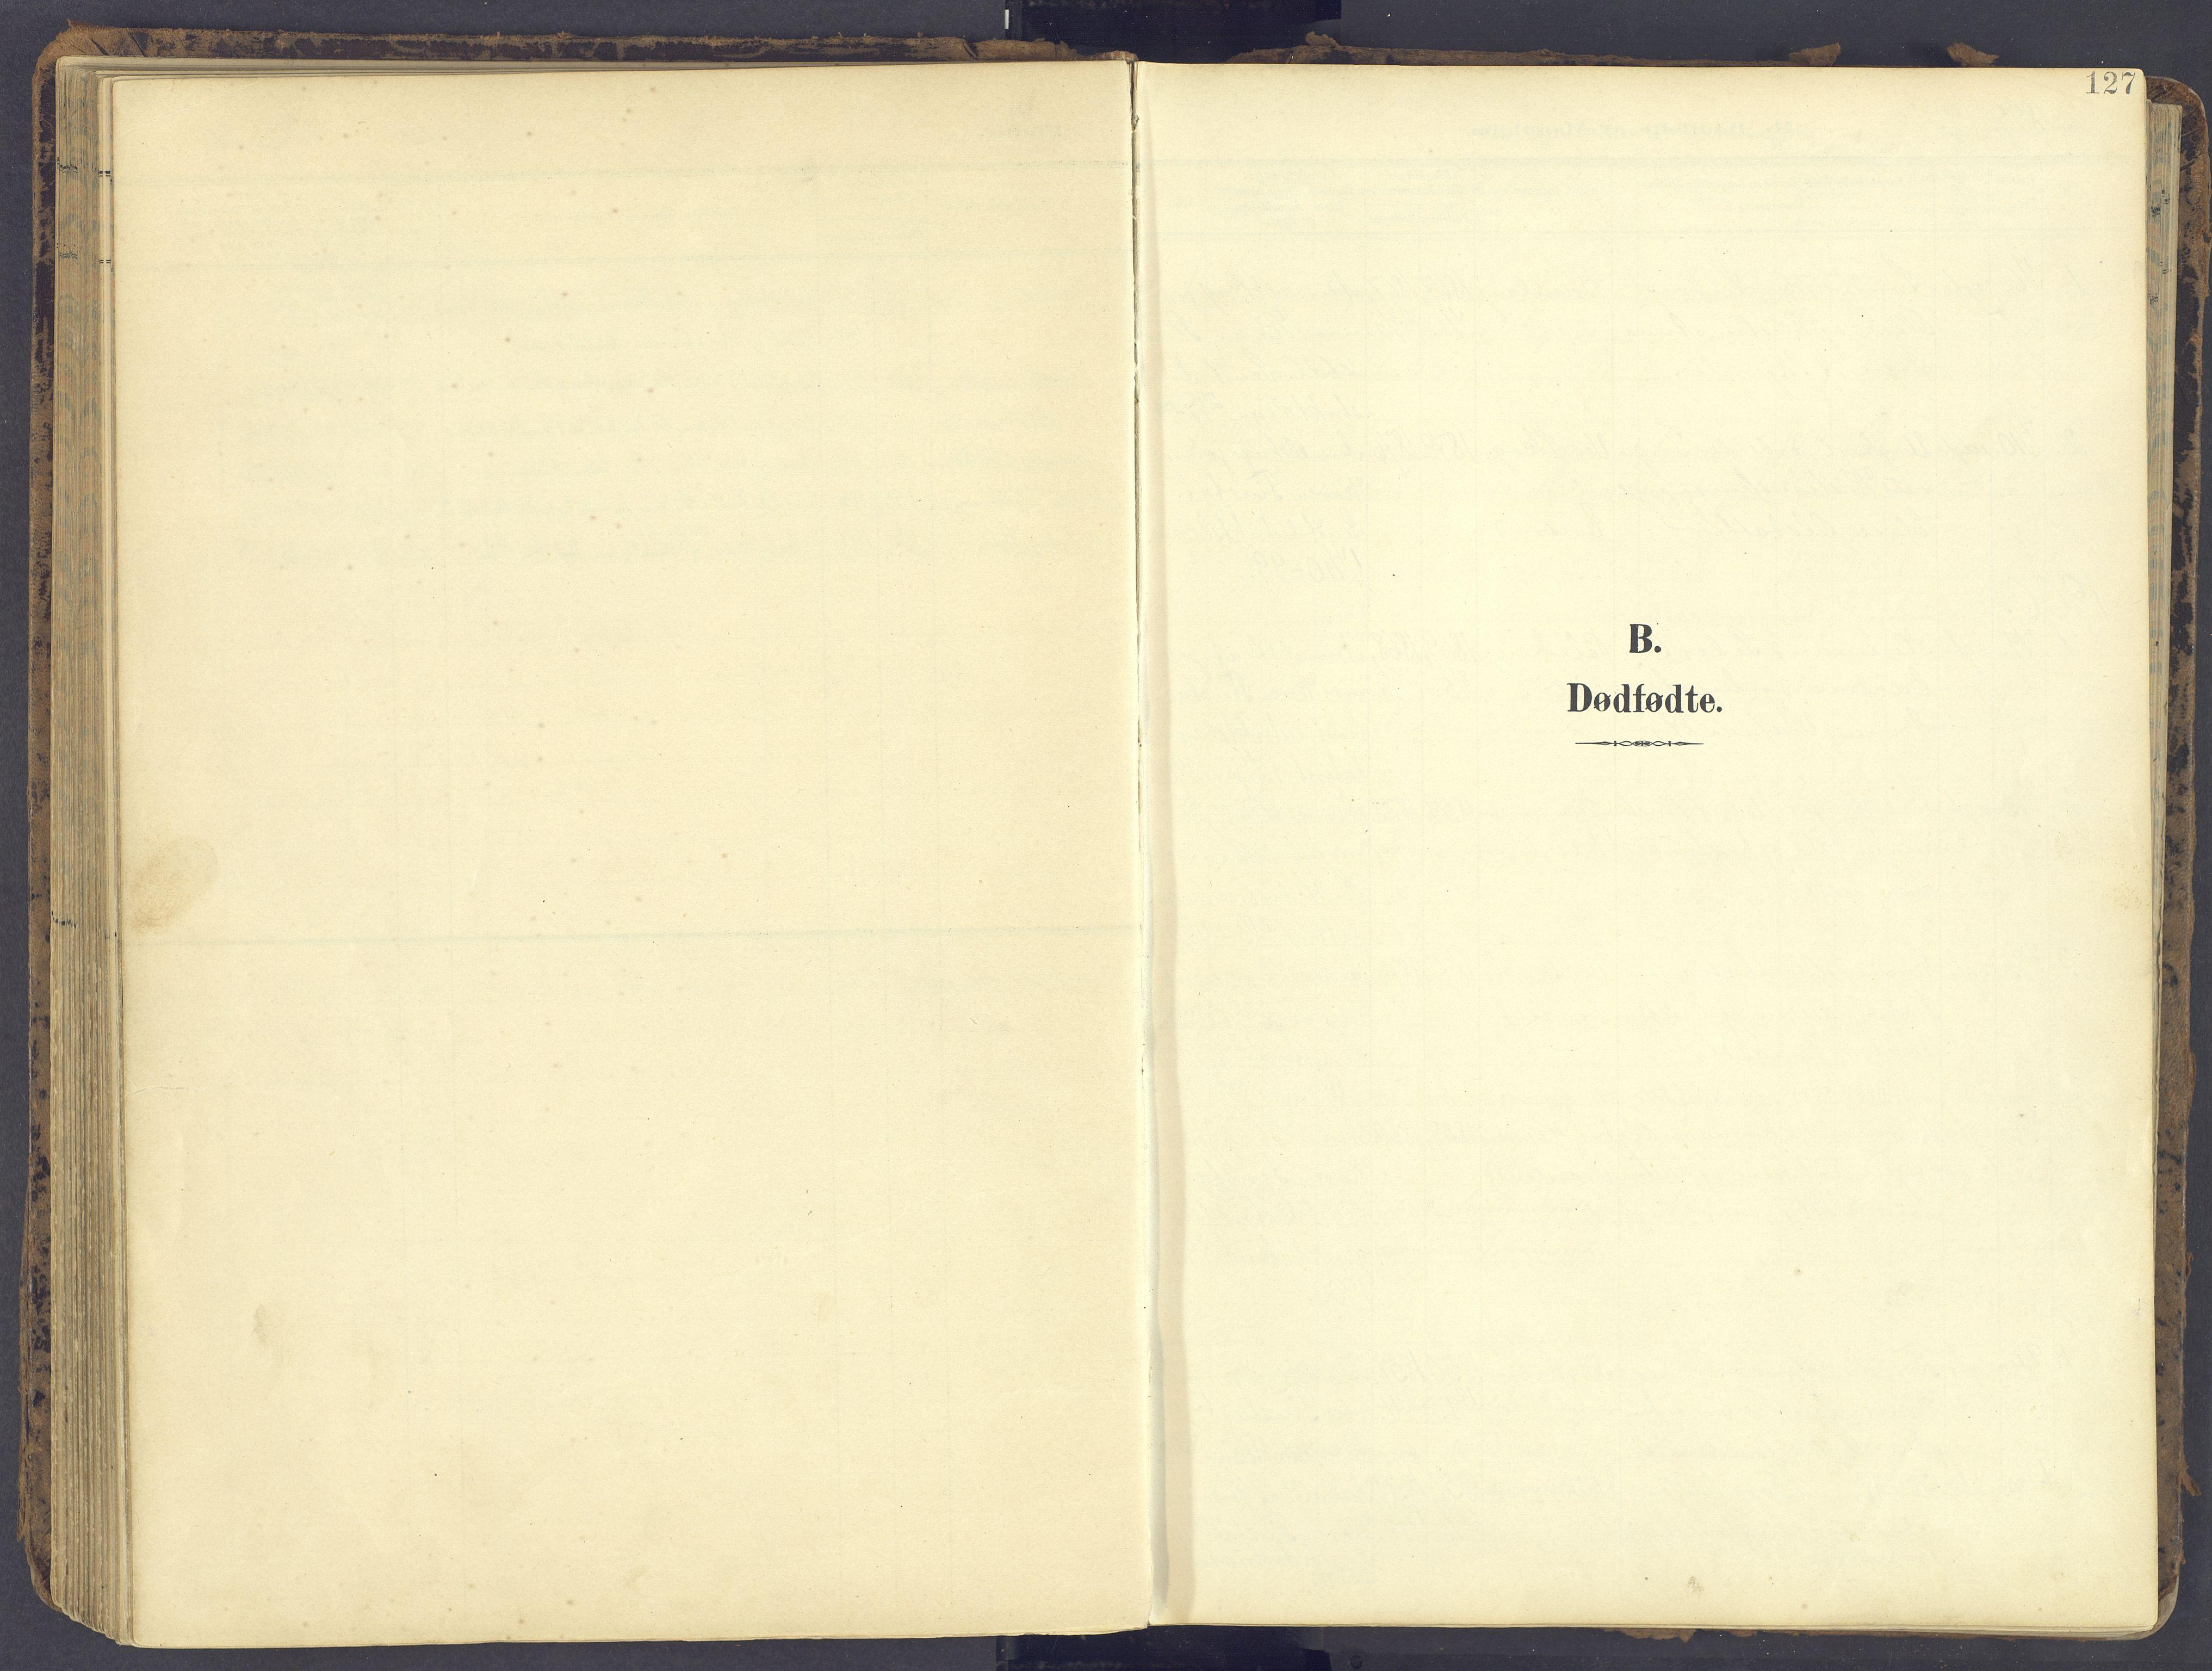 SAH, Fåberg prestekontor, Ministerialbok nr. 12, 1899-1915, s. 127